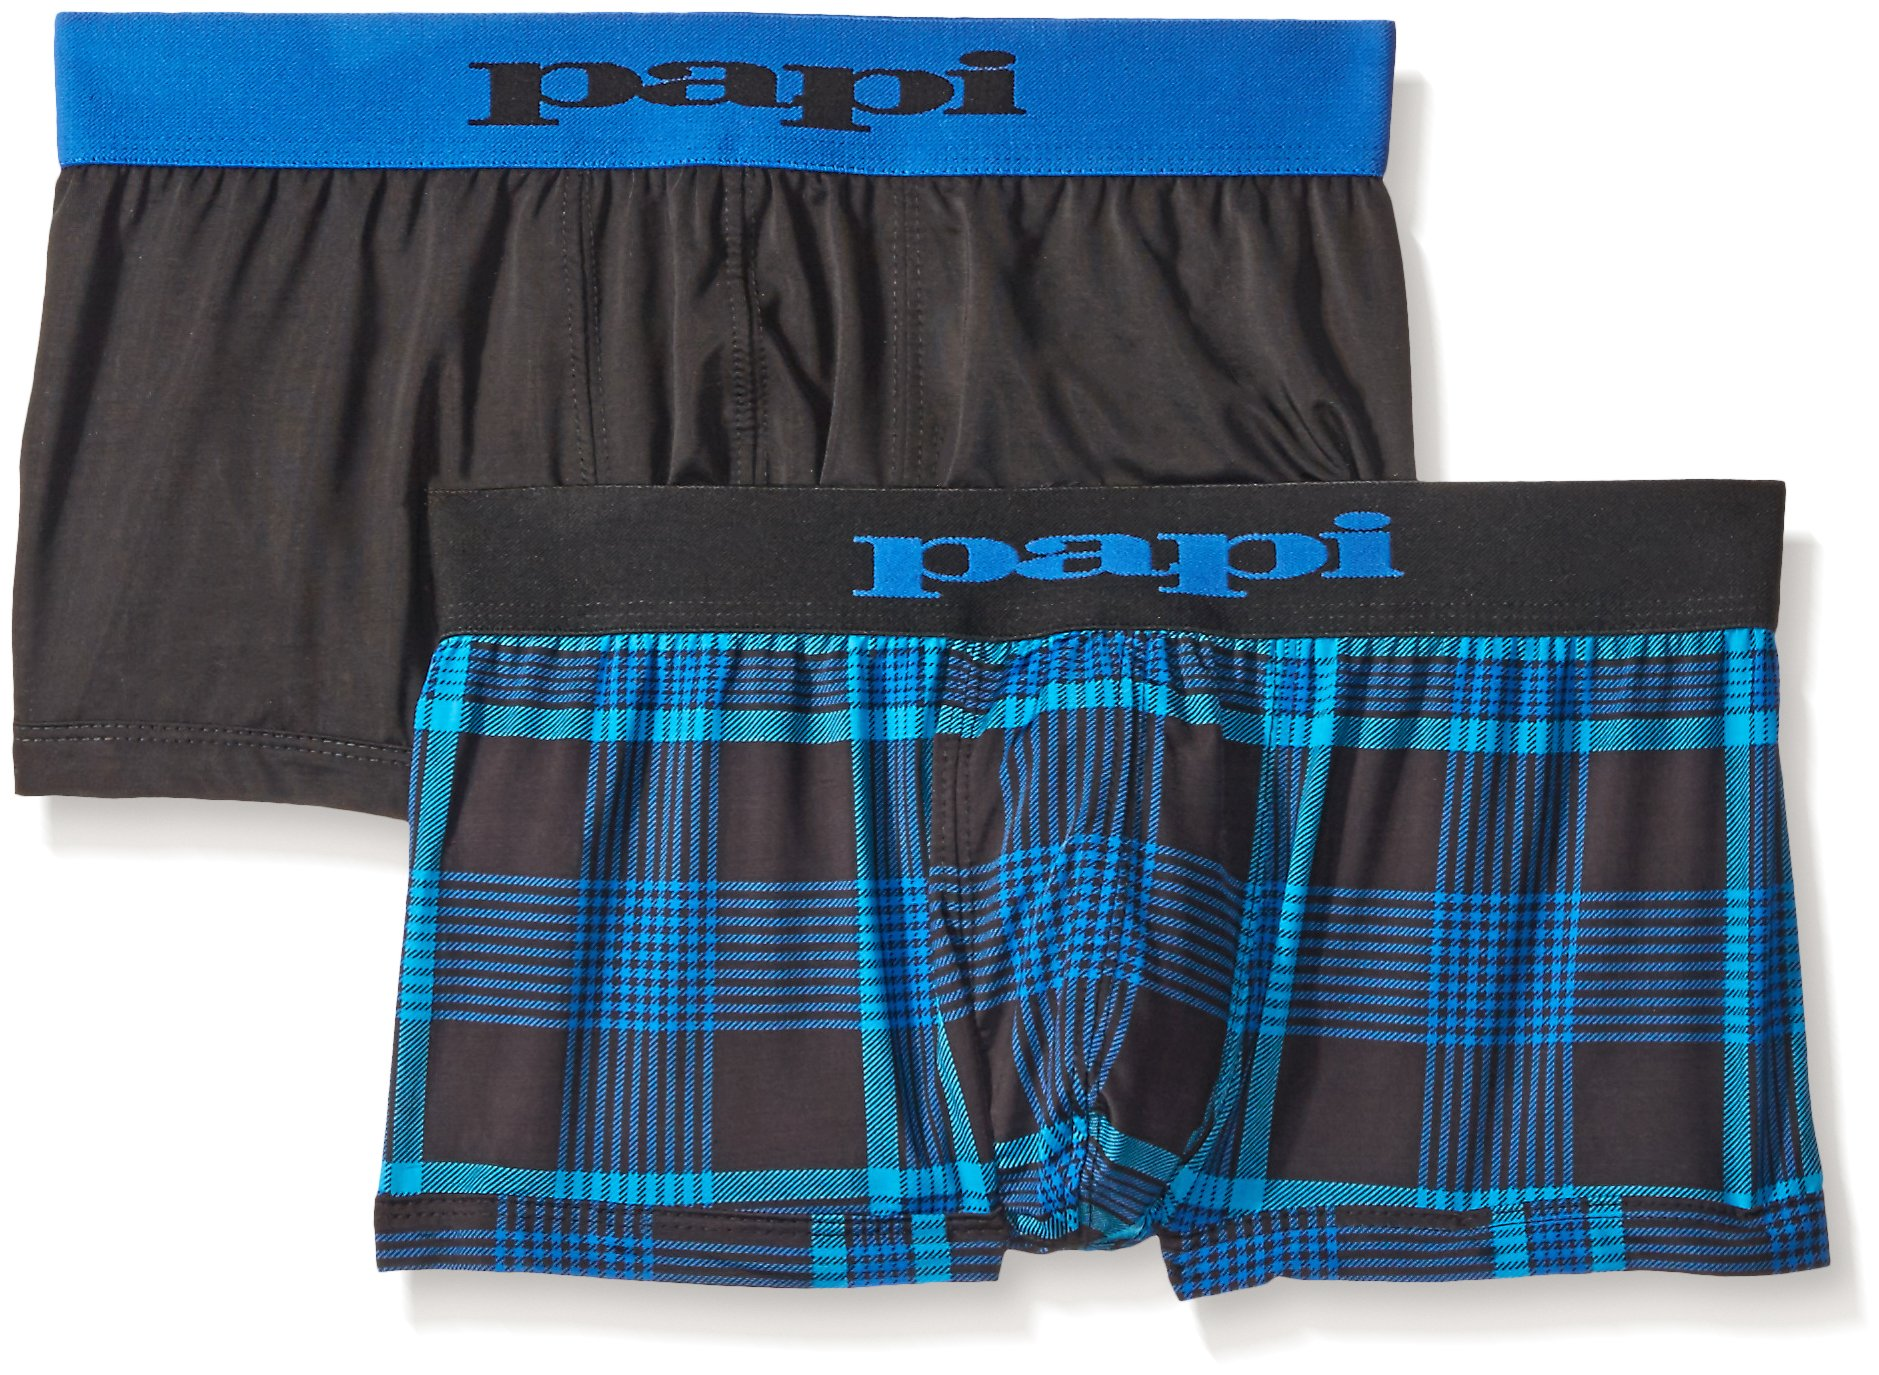 Papi Men's Cool 2-Pack Brazilian Plaid Trunk, Black/Blue, Large by papi